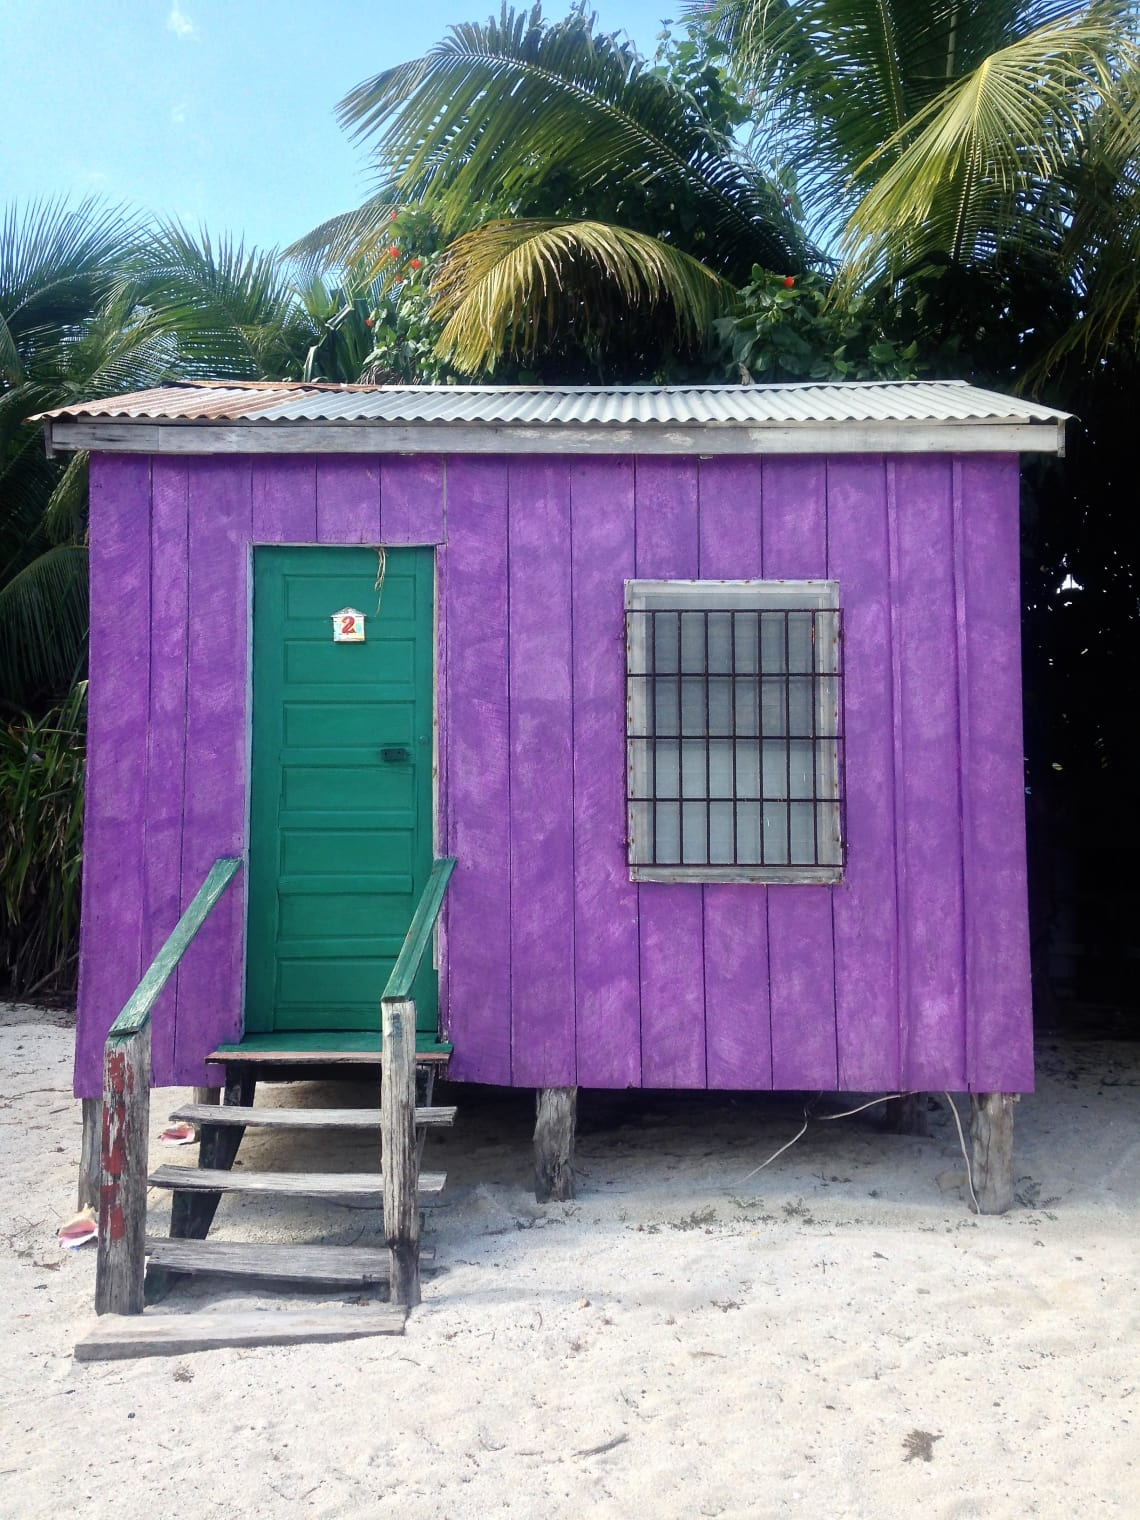 IlhaCaye Caulker, Belize